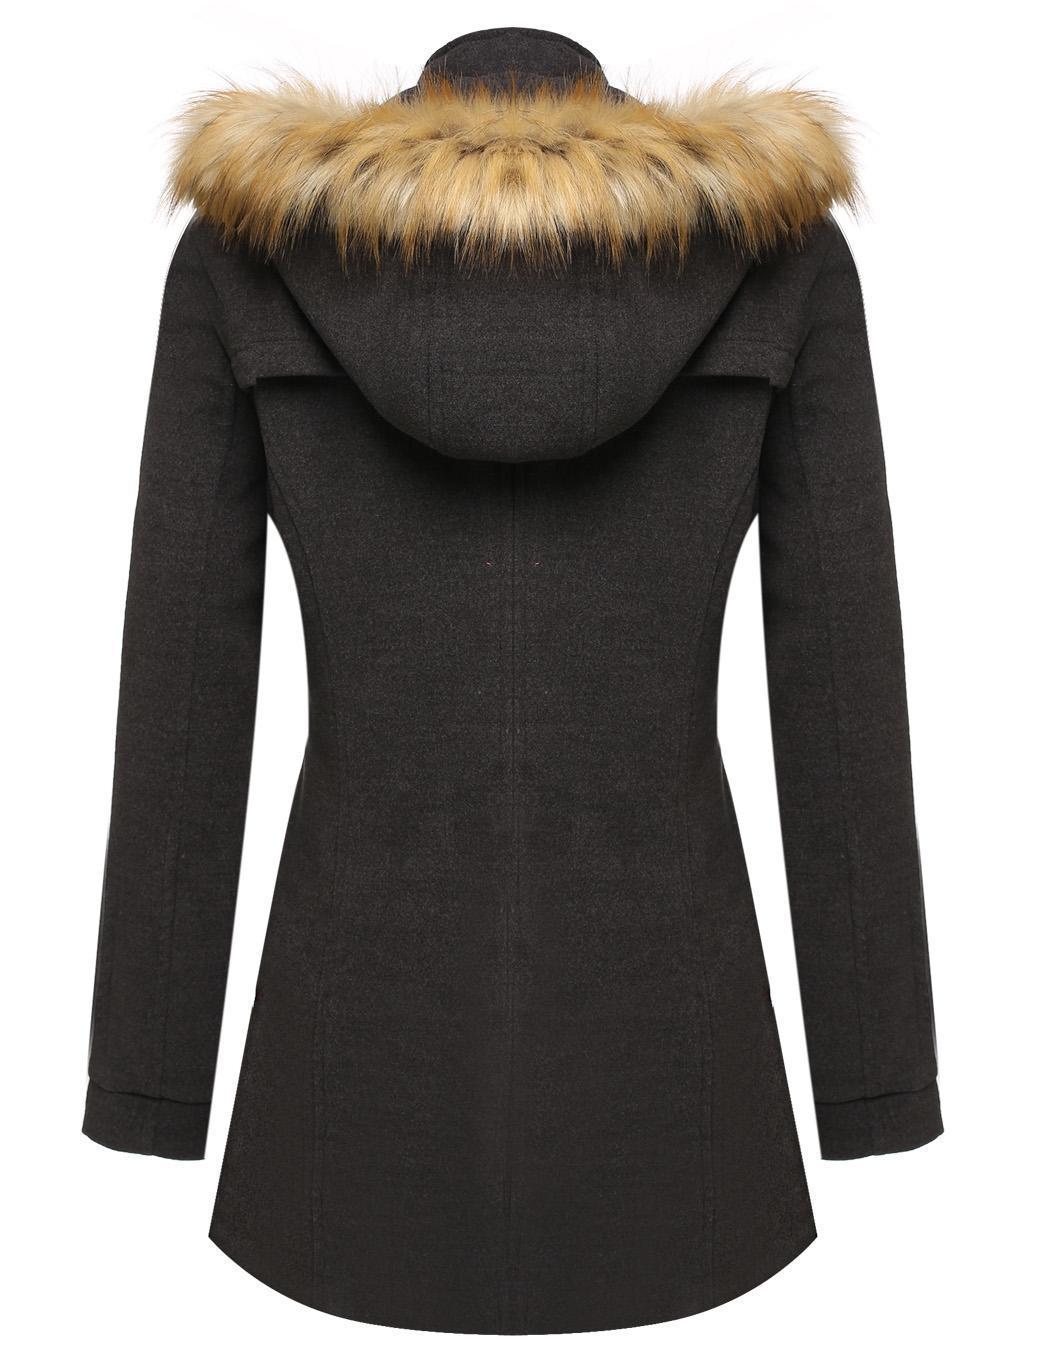 Women Detachable Faux Fur Hooded Long Solid Slim Wool Blend Coat 2